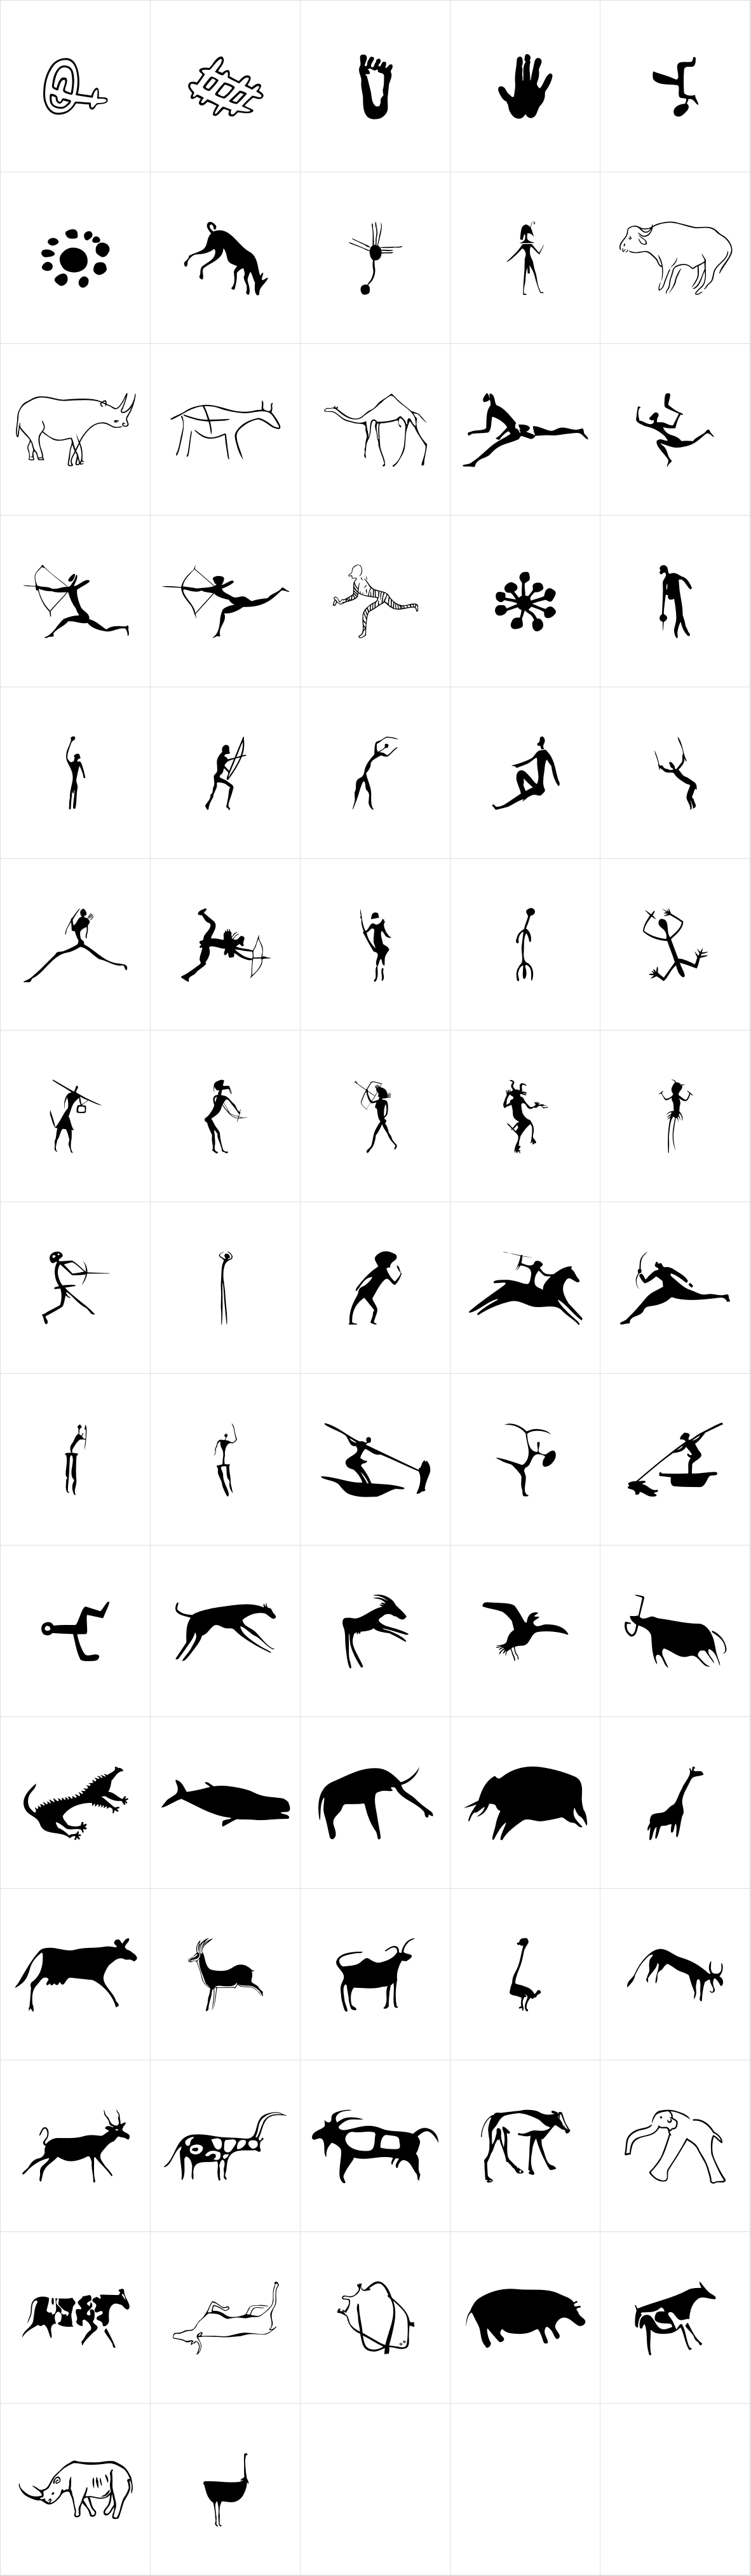 P22 Petroglyphs African